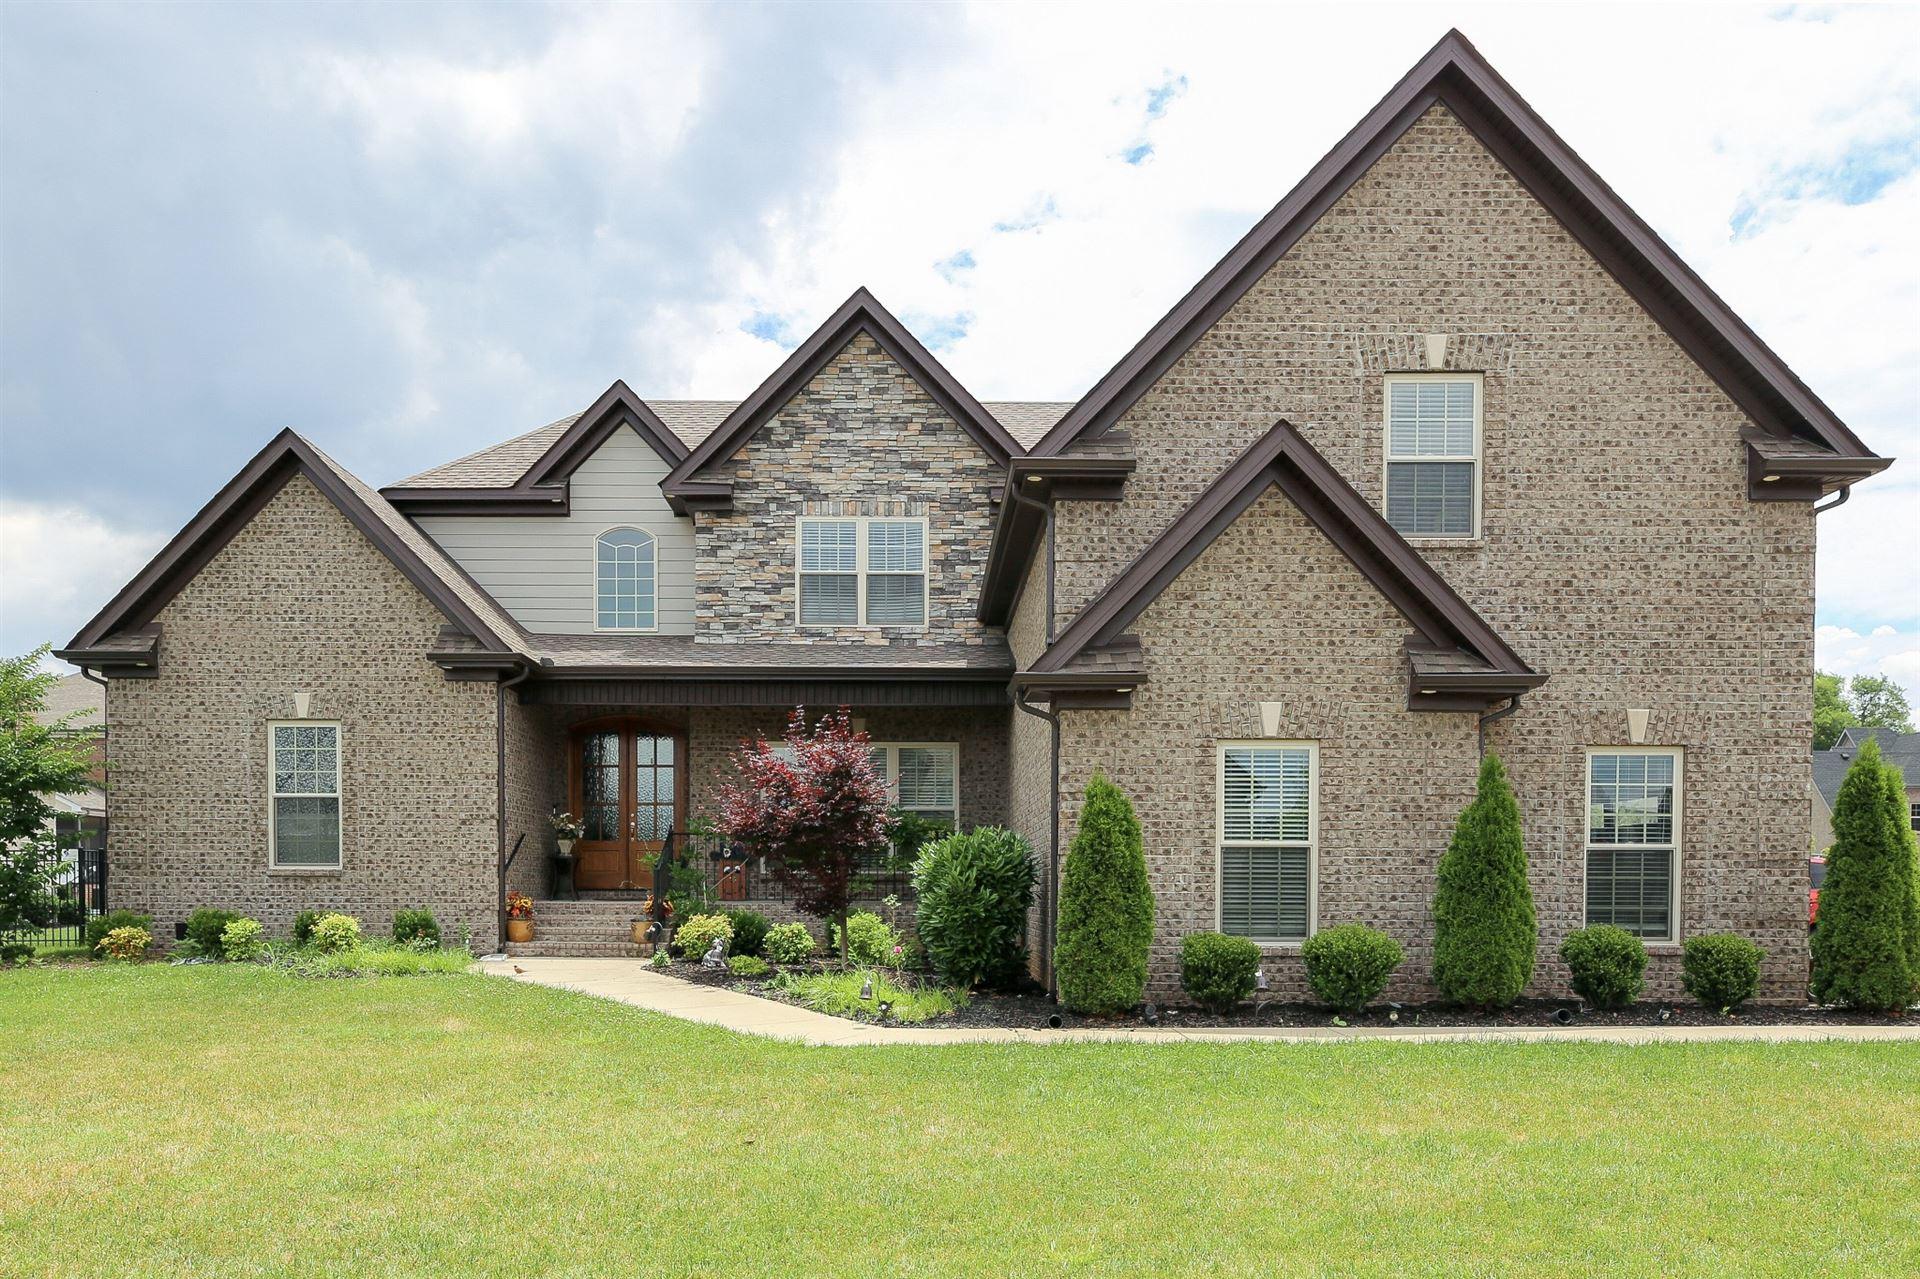 3316 Clovercroft Dr, Murfreesboro, TN 37130 - MLS#: 2175290